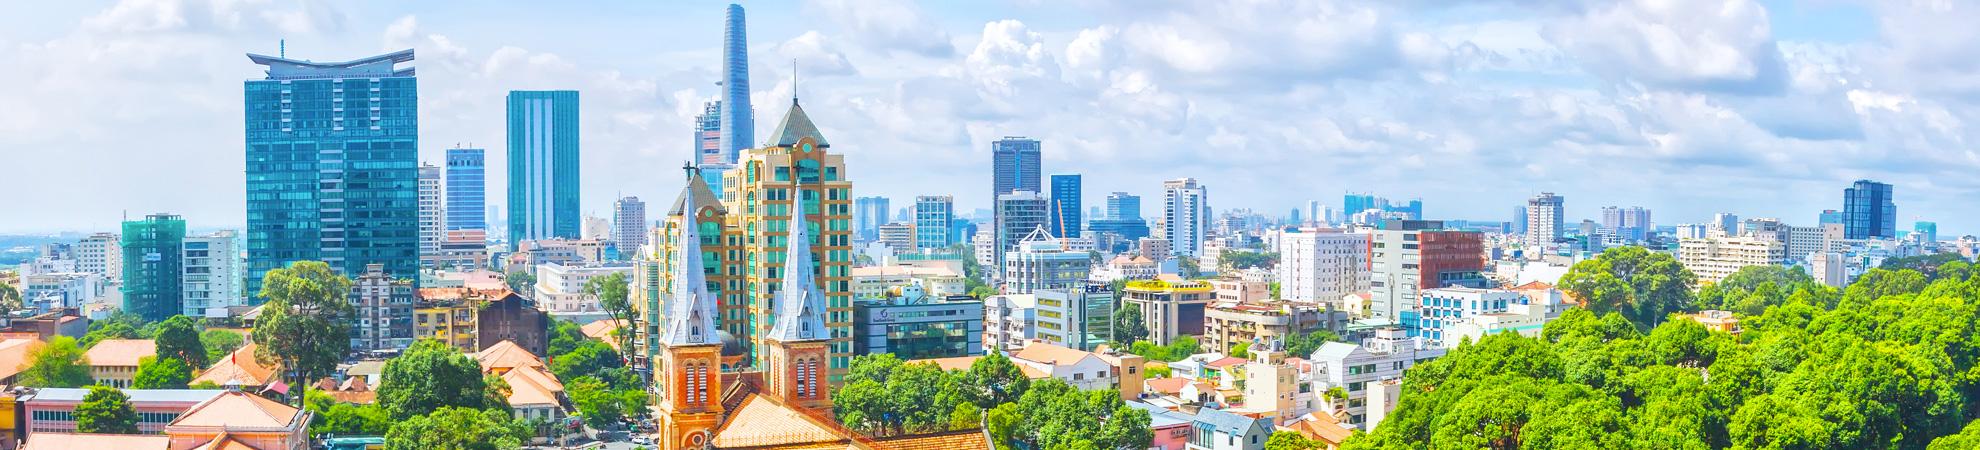 Villes du Vietnam